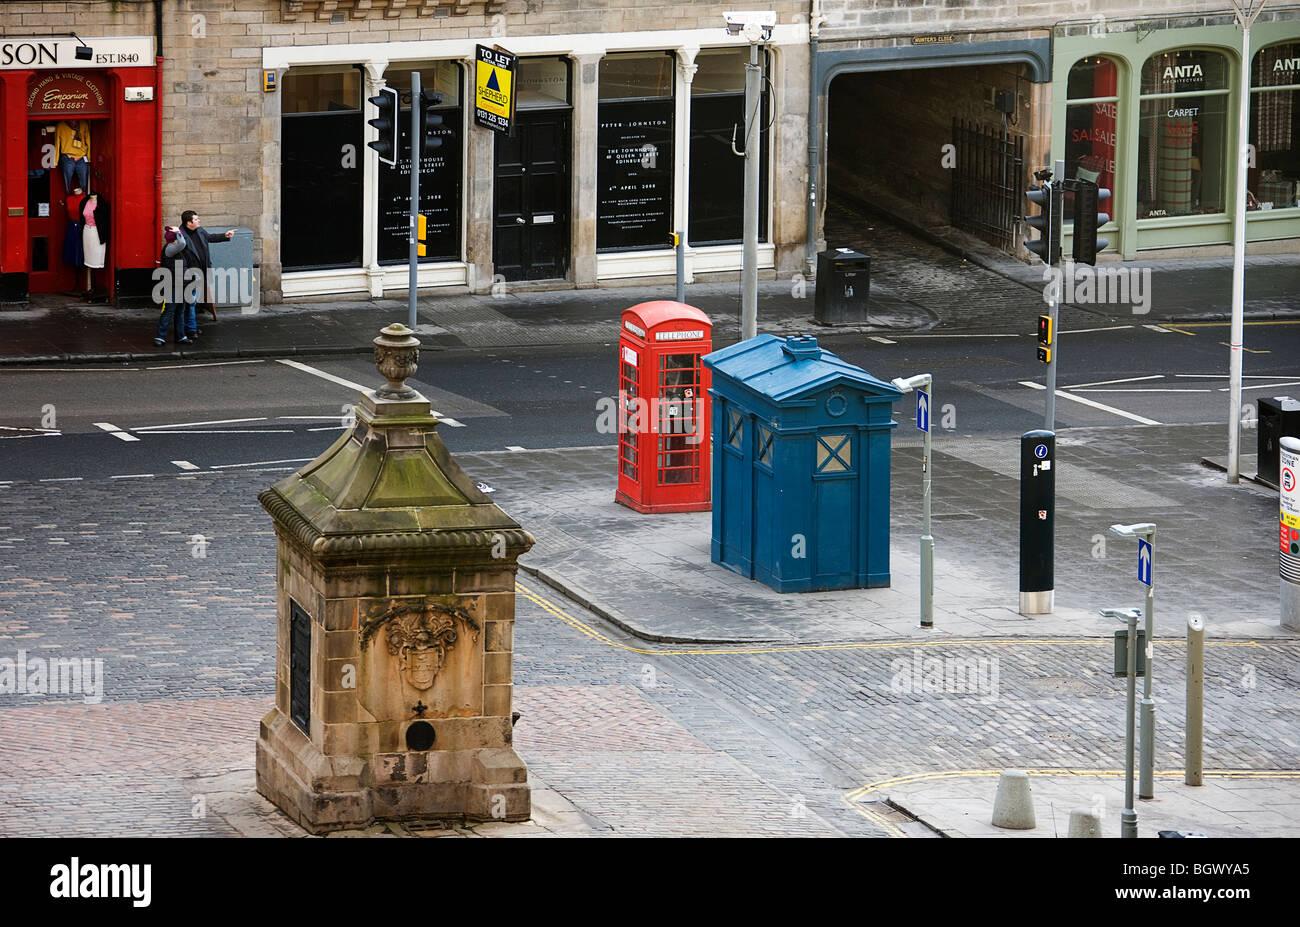 West Bow well. Street furniture. Grassmarket. Edinburgh - Stock Image